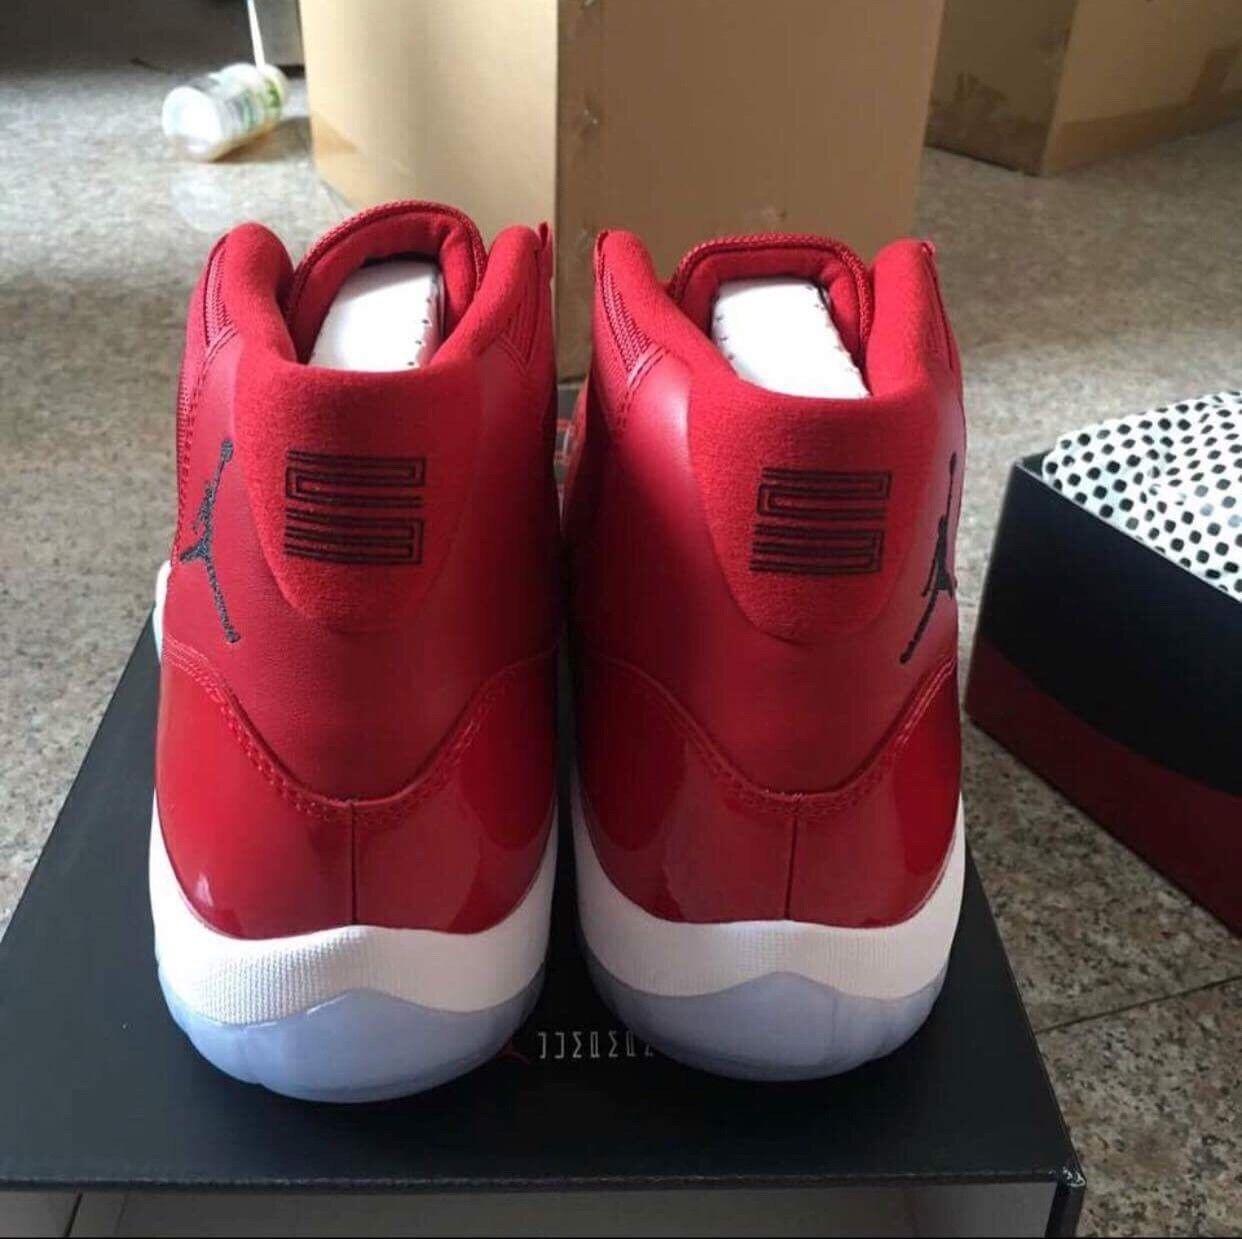 Nike Air Jordan XI 11 Retro Win Like 96 Gym Red 378037-623 Size 10 Men